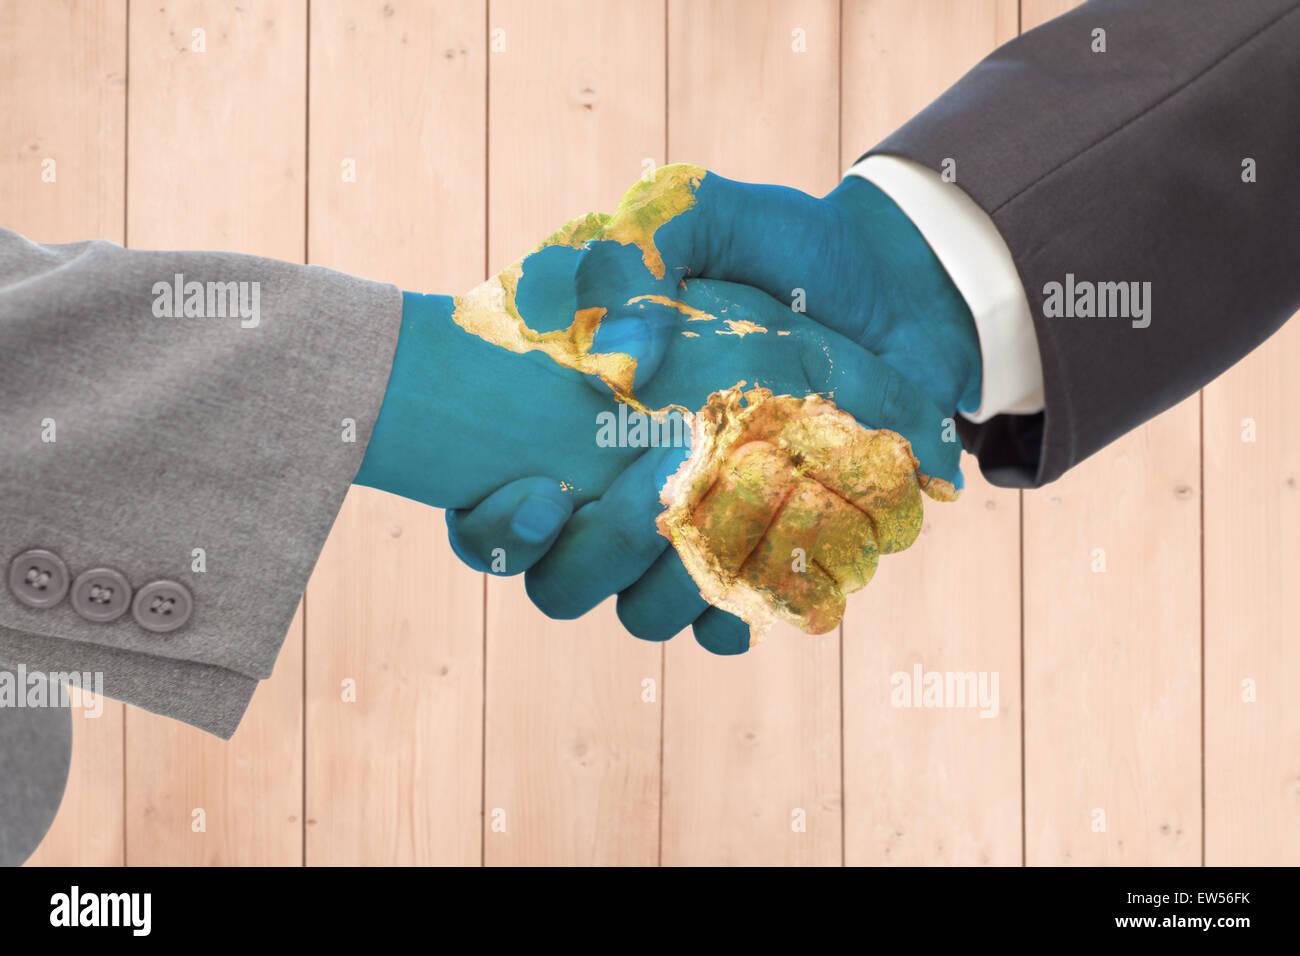 Composite image of handshake between two business people - Stock Image